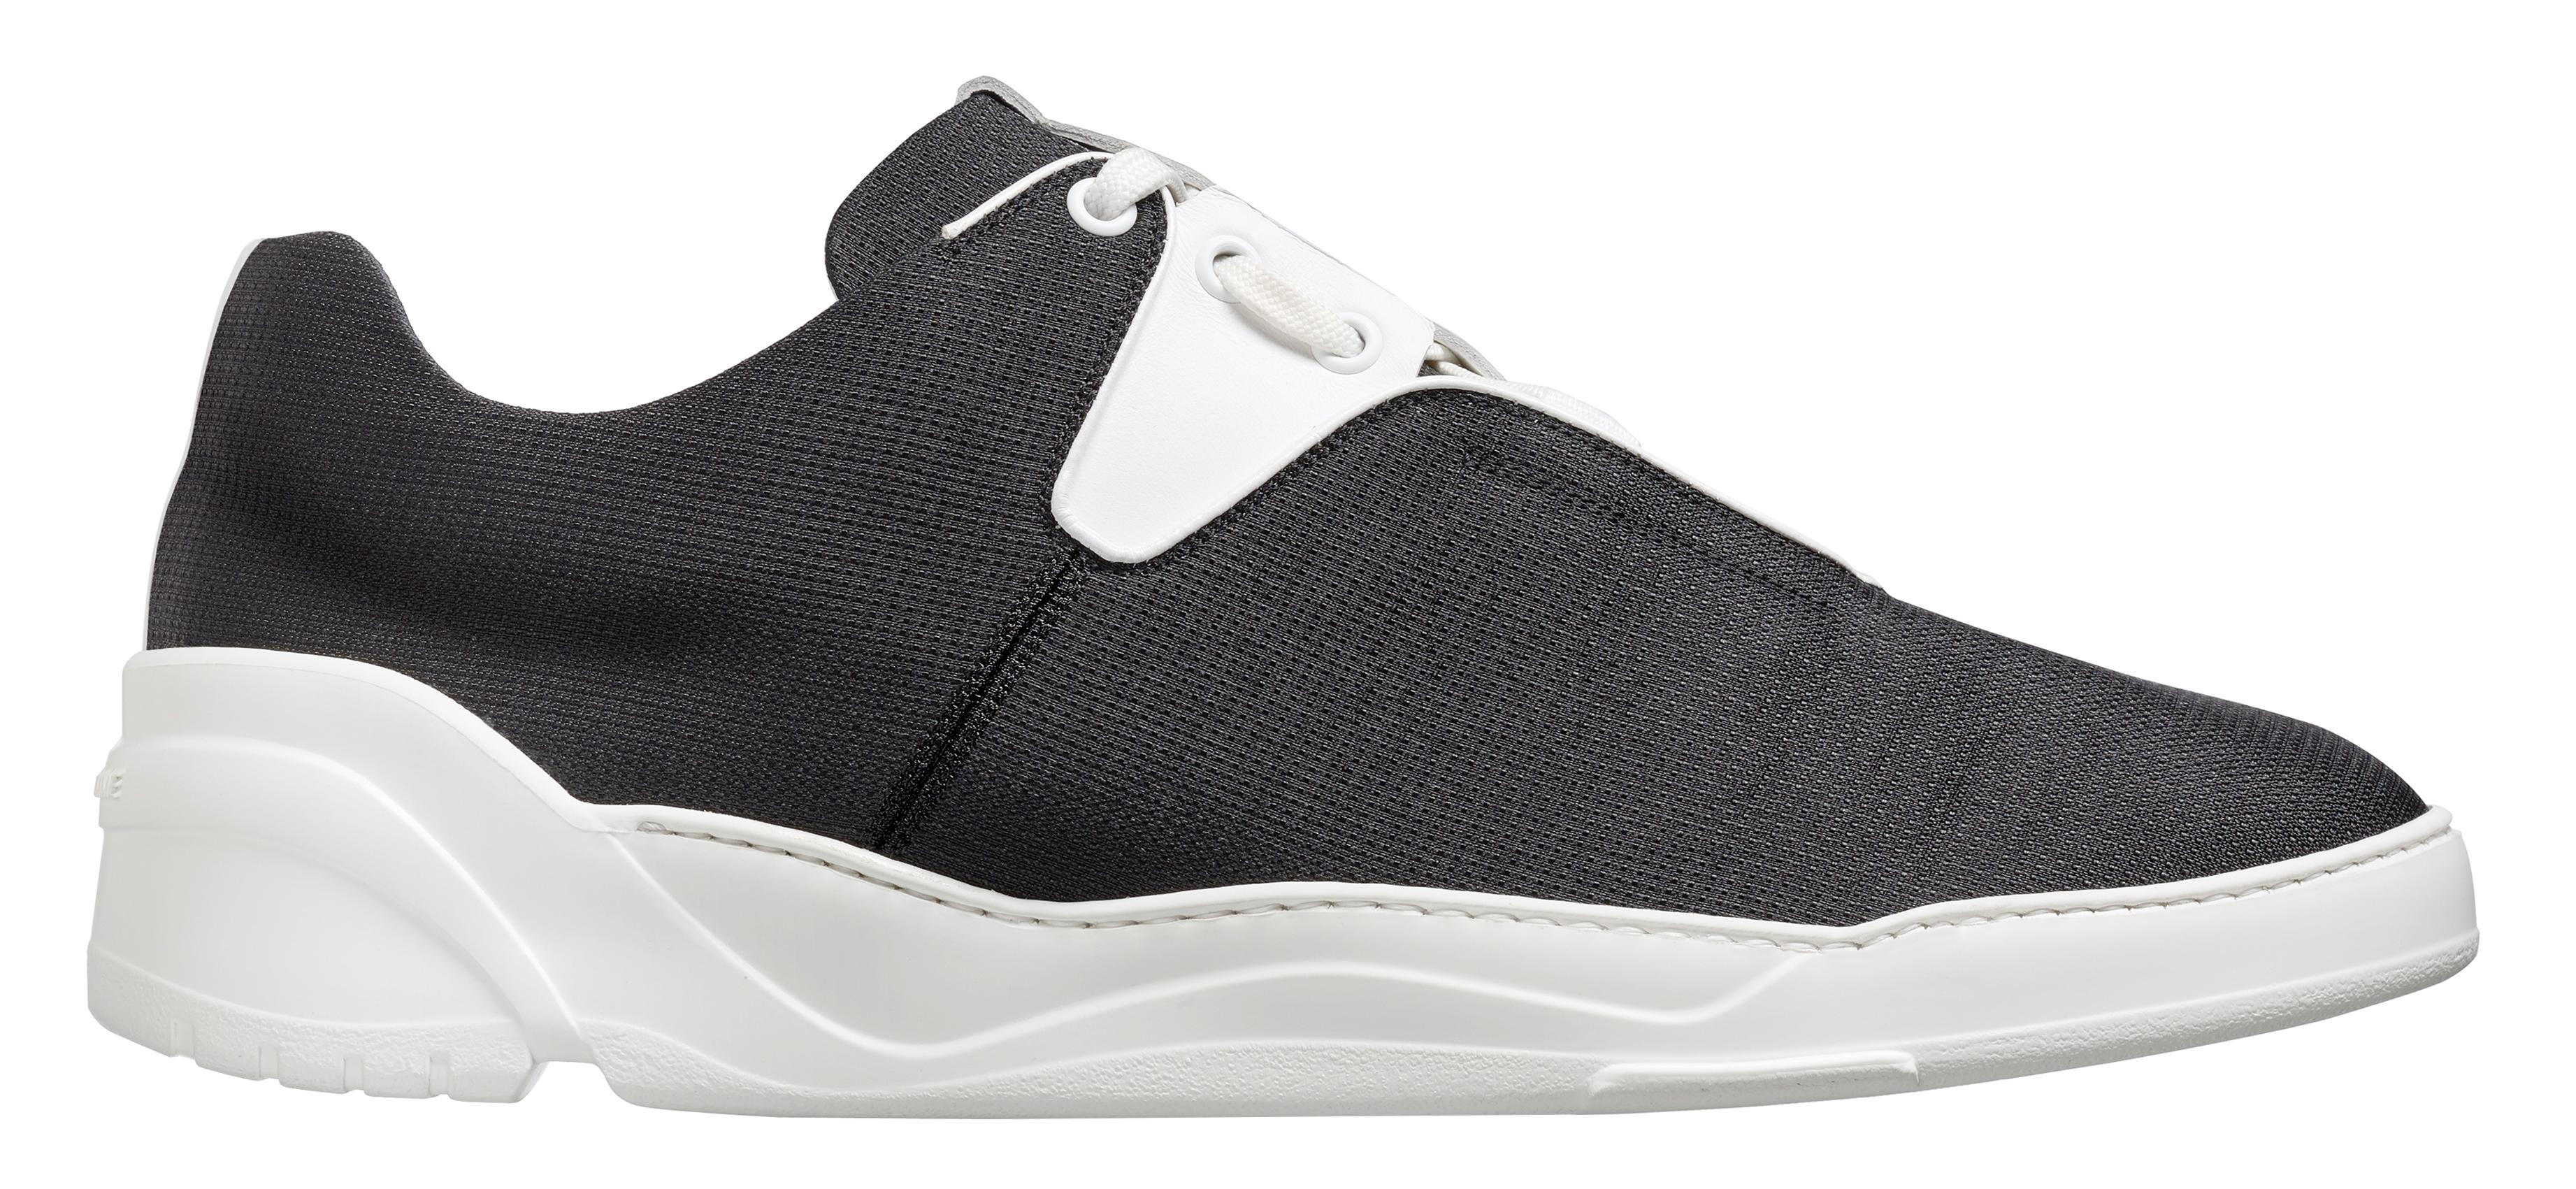 Dior Homme sneakers B17 for Winter 2015 - Crash 1462b6e49e6